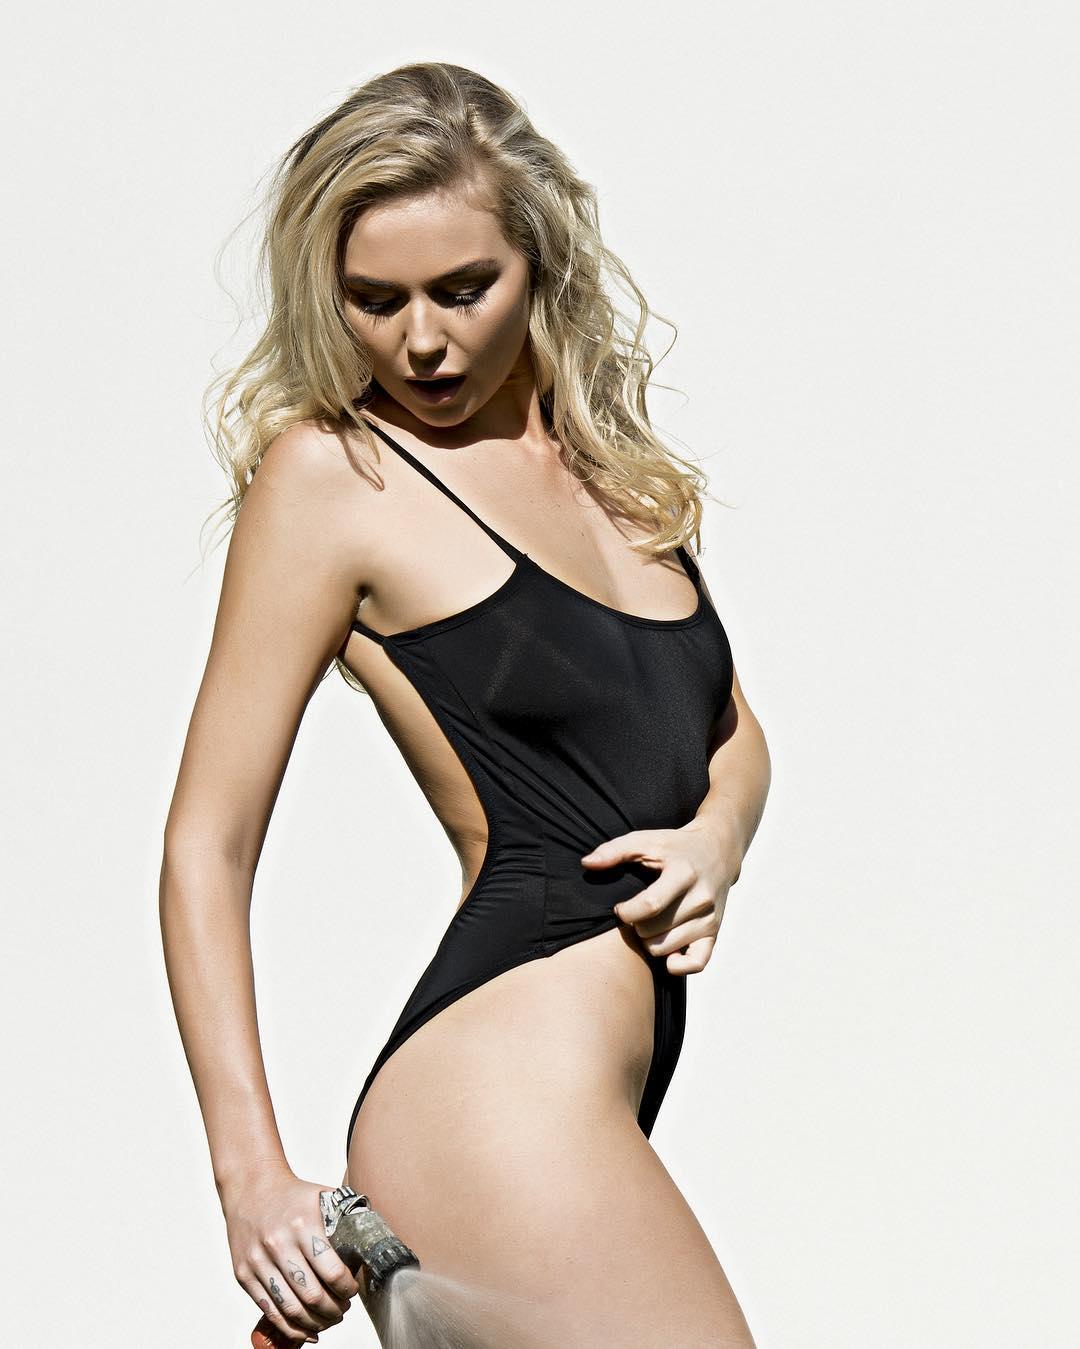 Paige Marie Evans nude (84 foto and video), Pussy, Bikini, Feet, cameltoe 2019